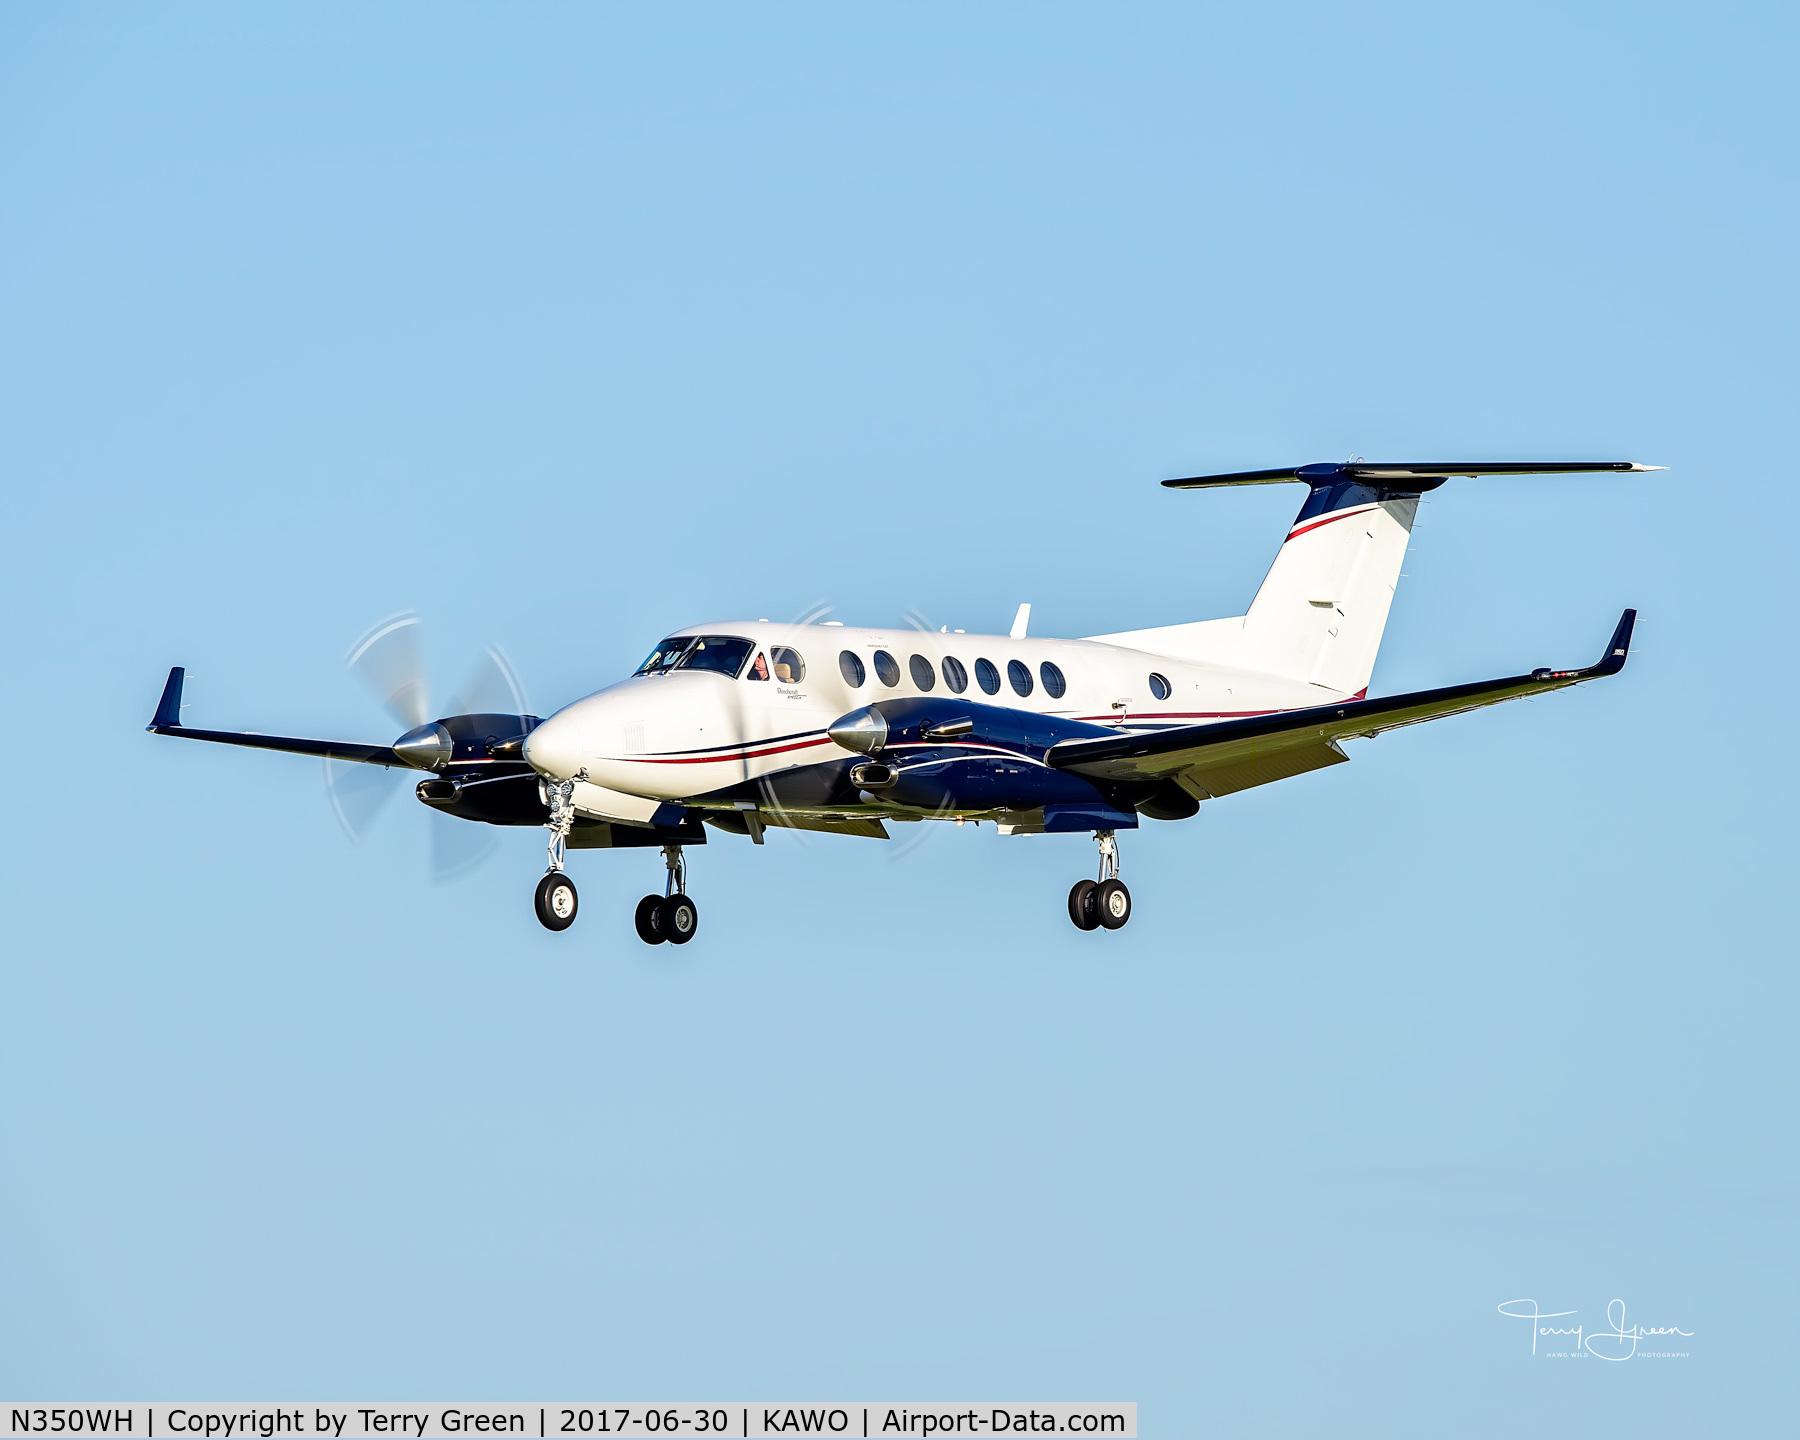 N350WH, Raytheon Aircraft Company B300 C/N FL-394, KAWO